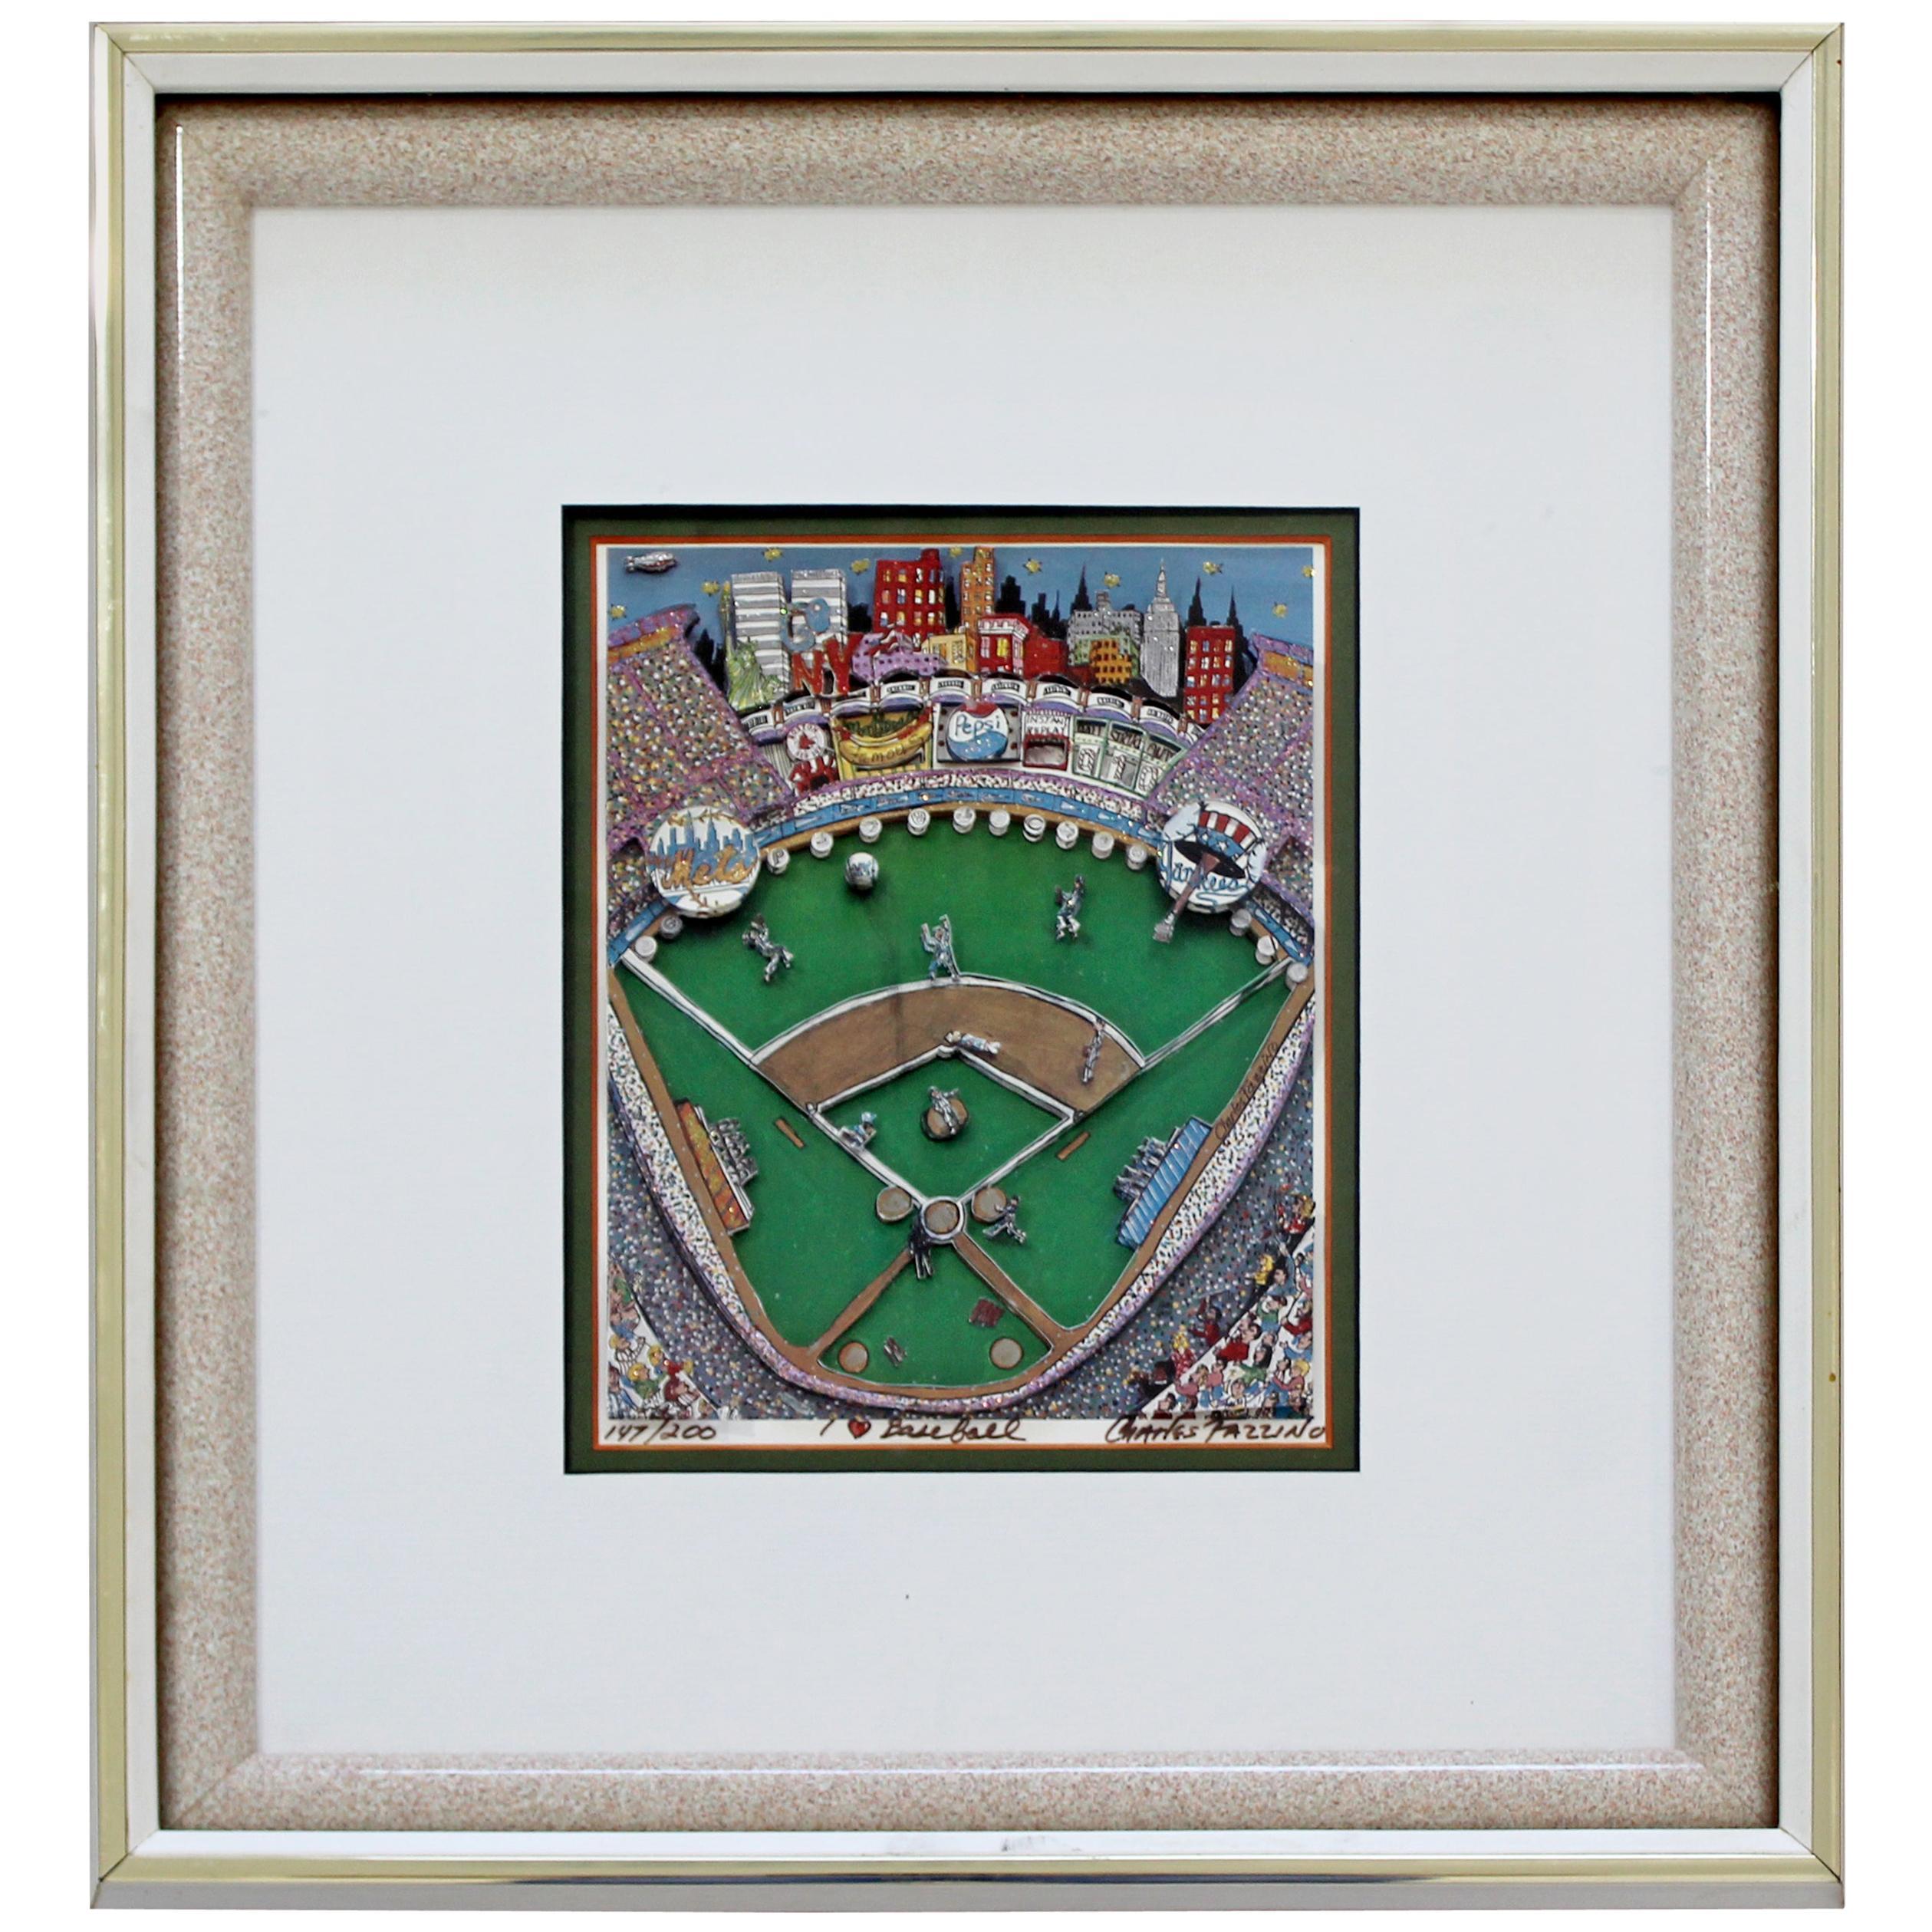 Contemporary Framed I Heart Baseball 3D Serigraph Signed Charles Fazzino 147/200